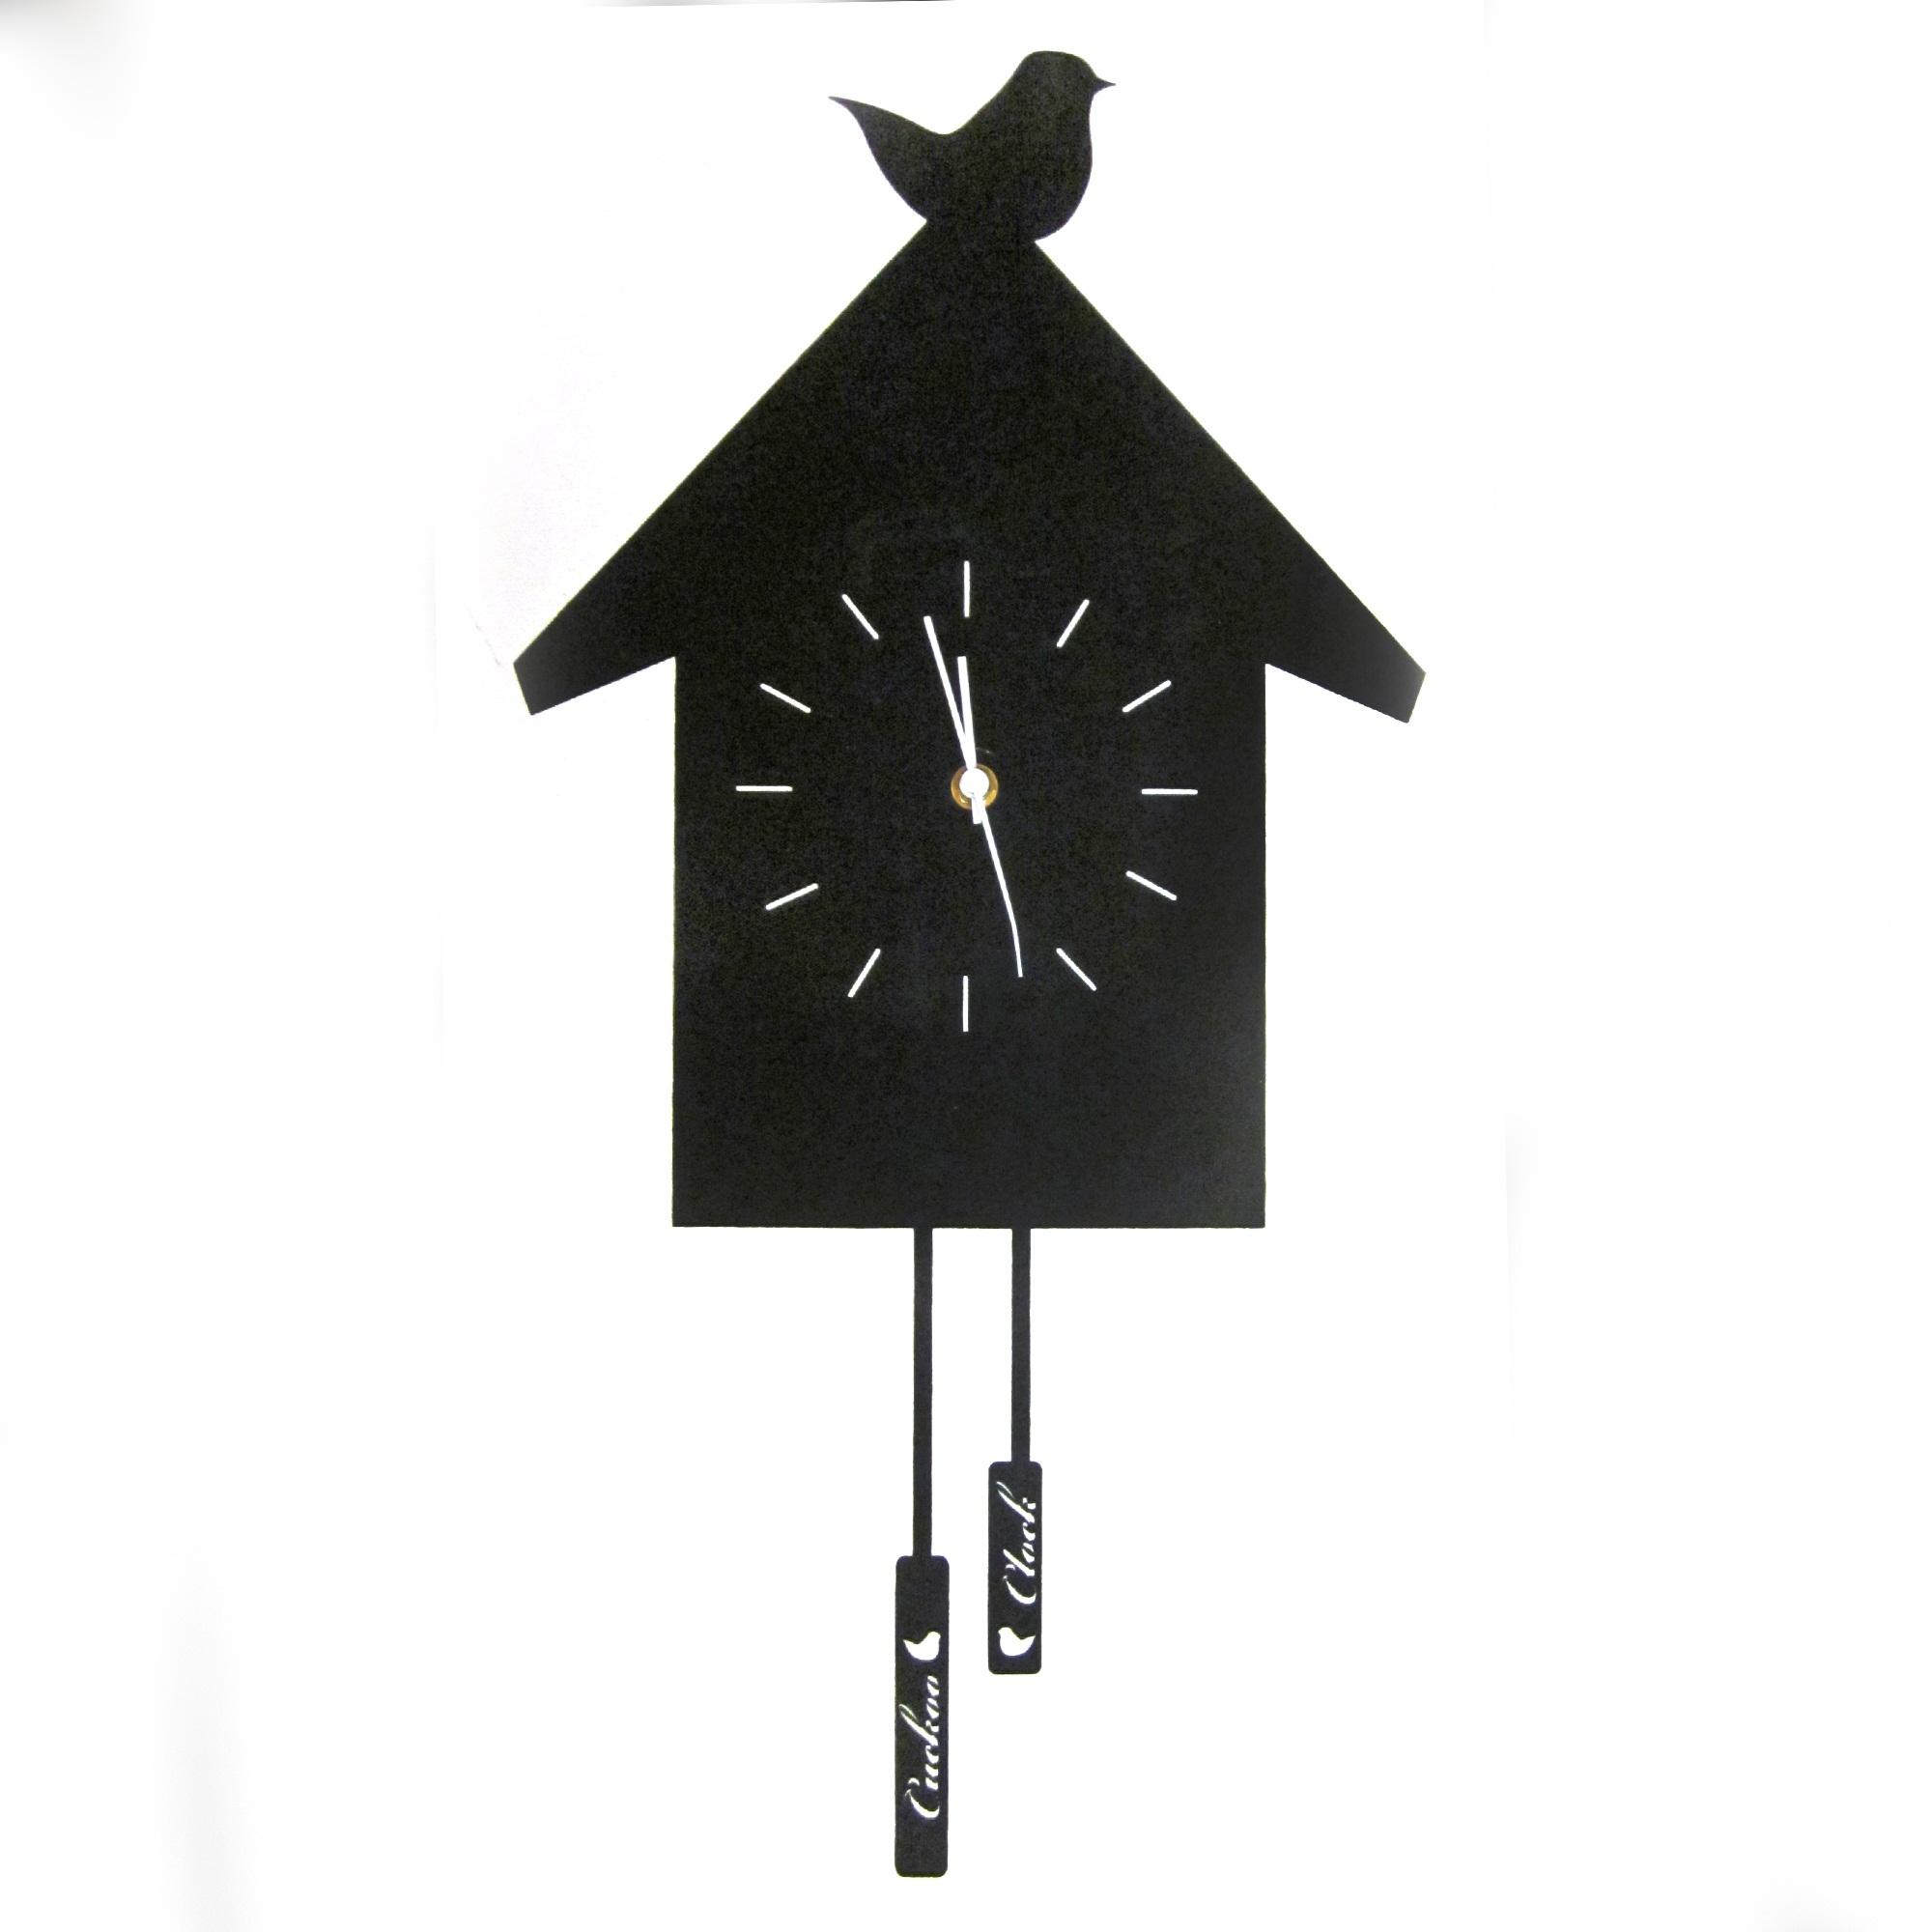 Modern cuckoo clock the treasure hunter well designed quirky and fun interiors homewares - Contemporary cuckoo clock ...